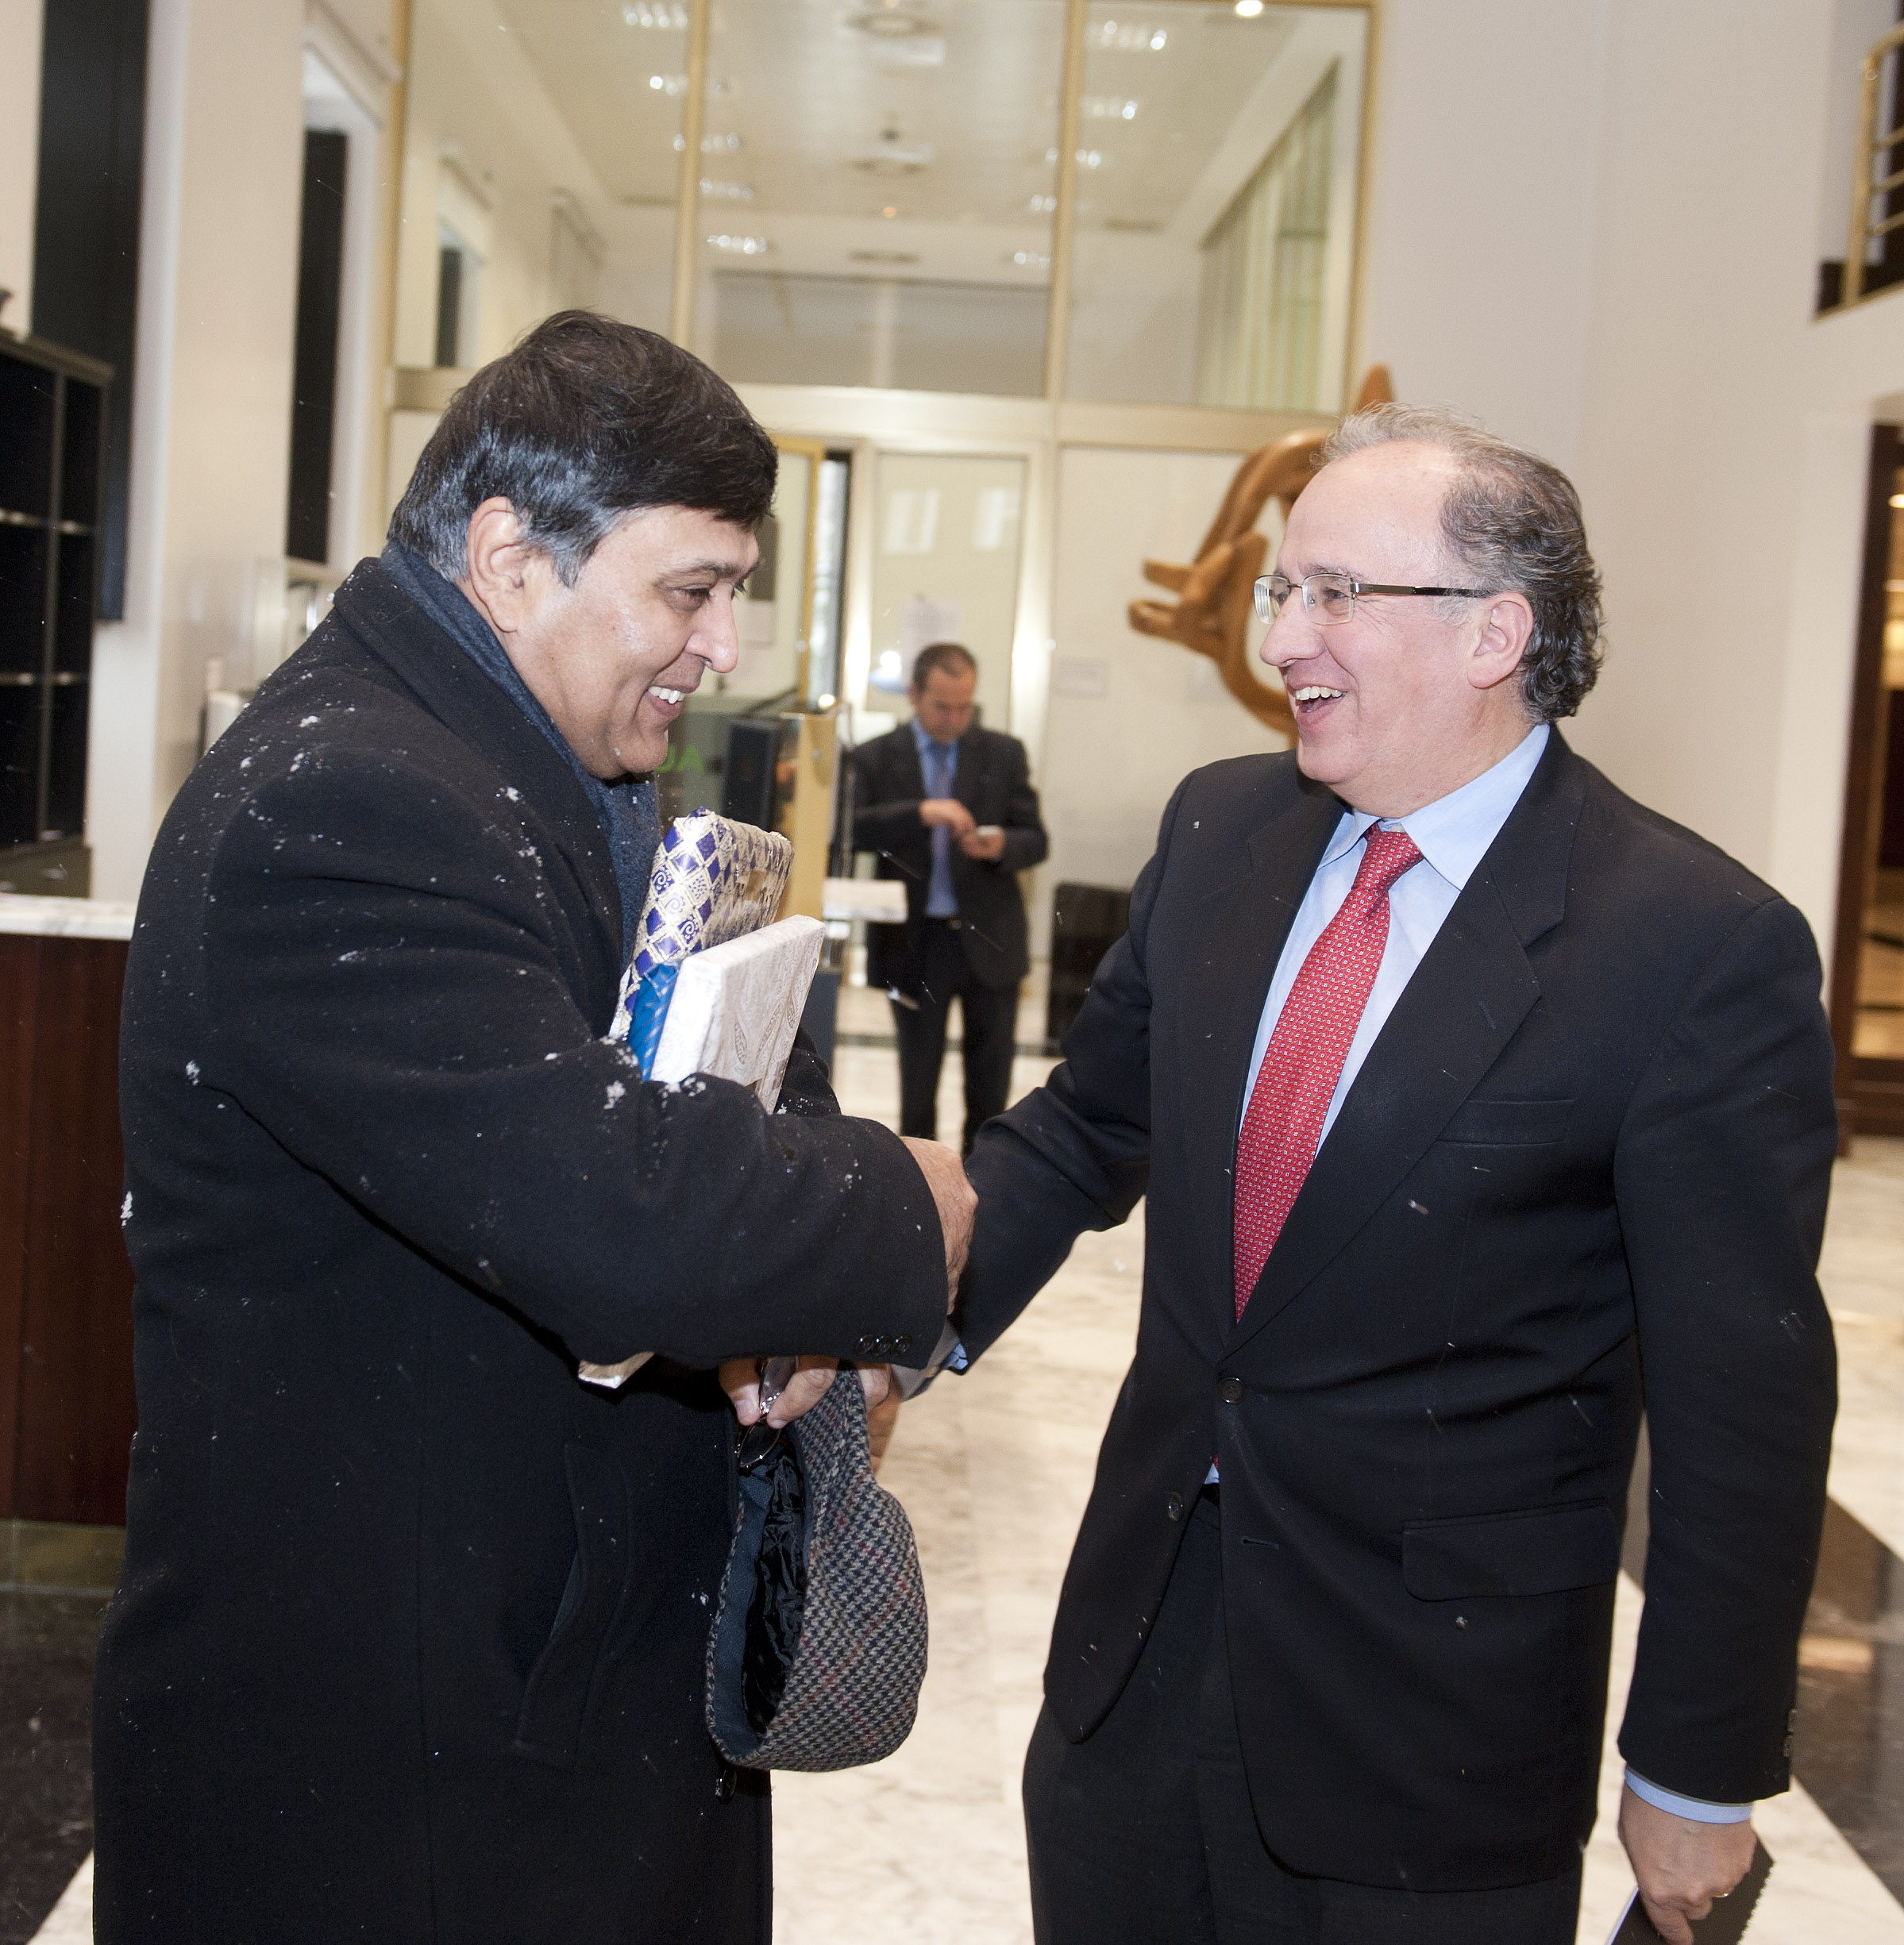 2012_02_02_lhk_embajador_indio2.jpg